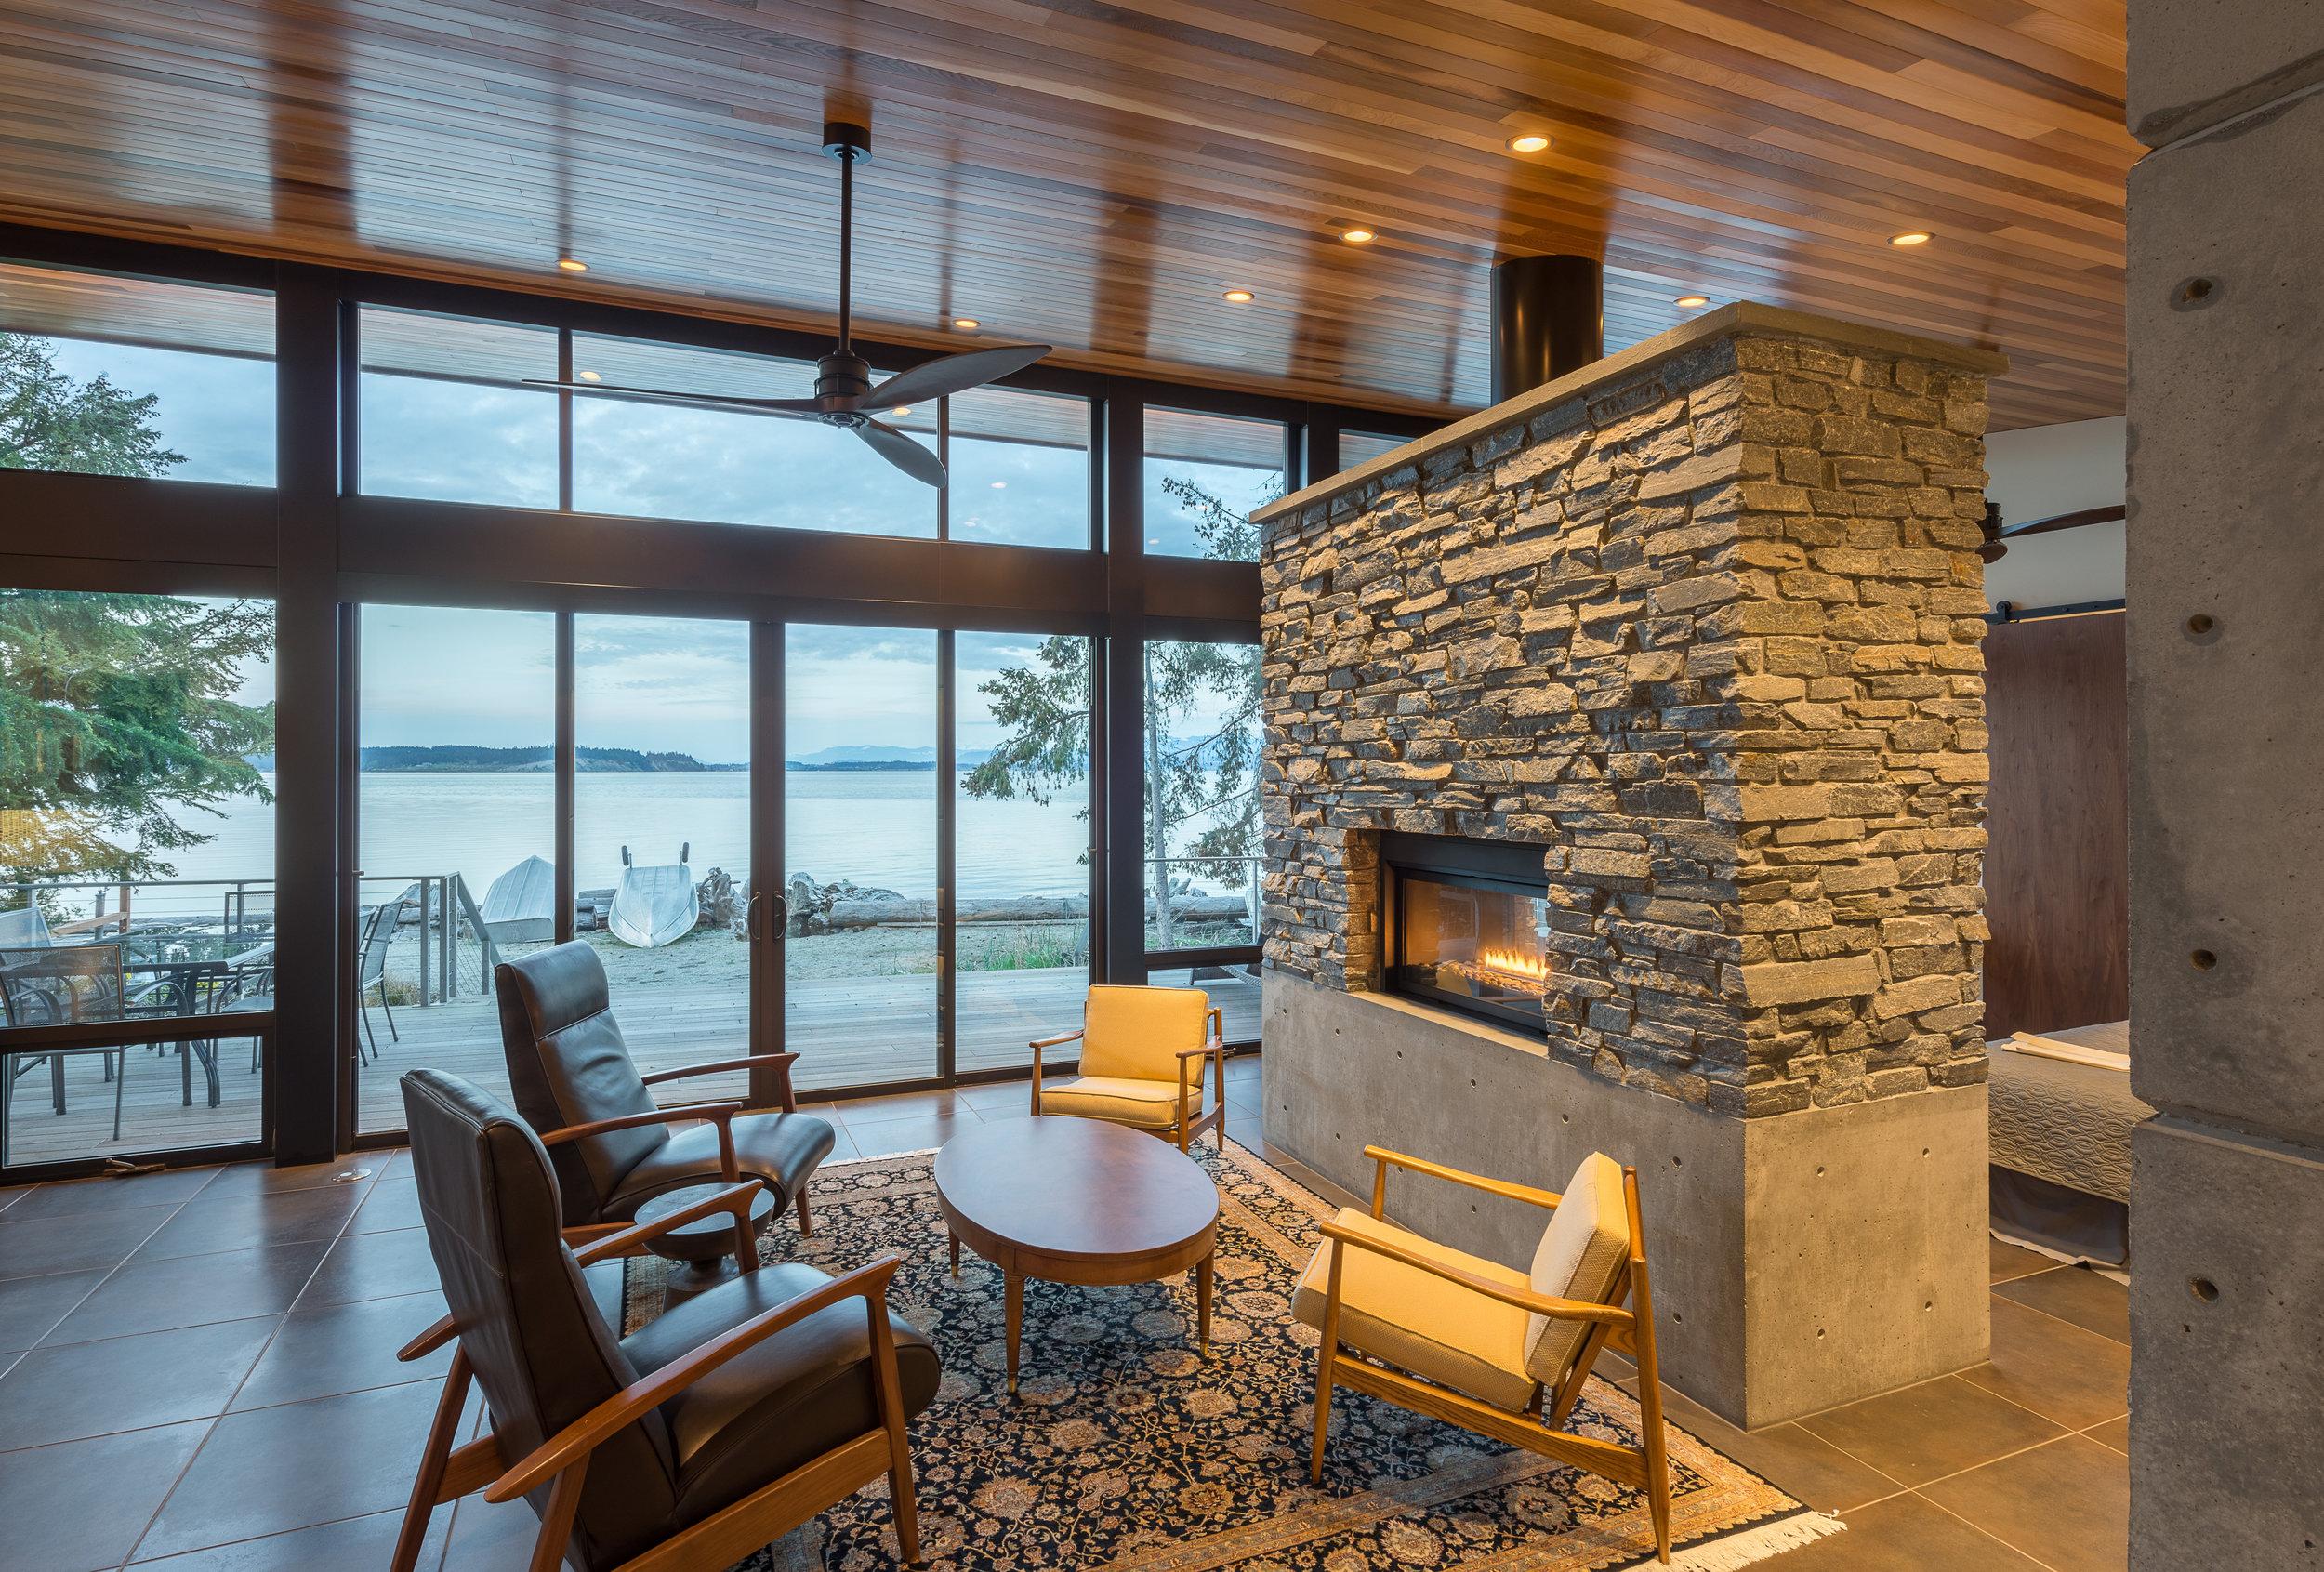 09 - Camano Beach Drive House 5000px - Swift Studio.jpg